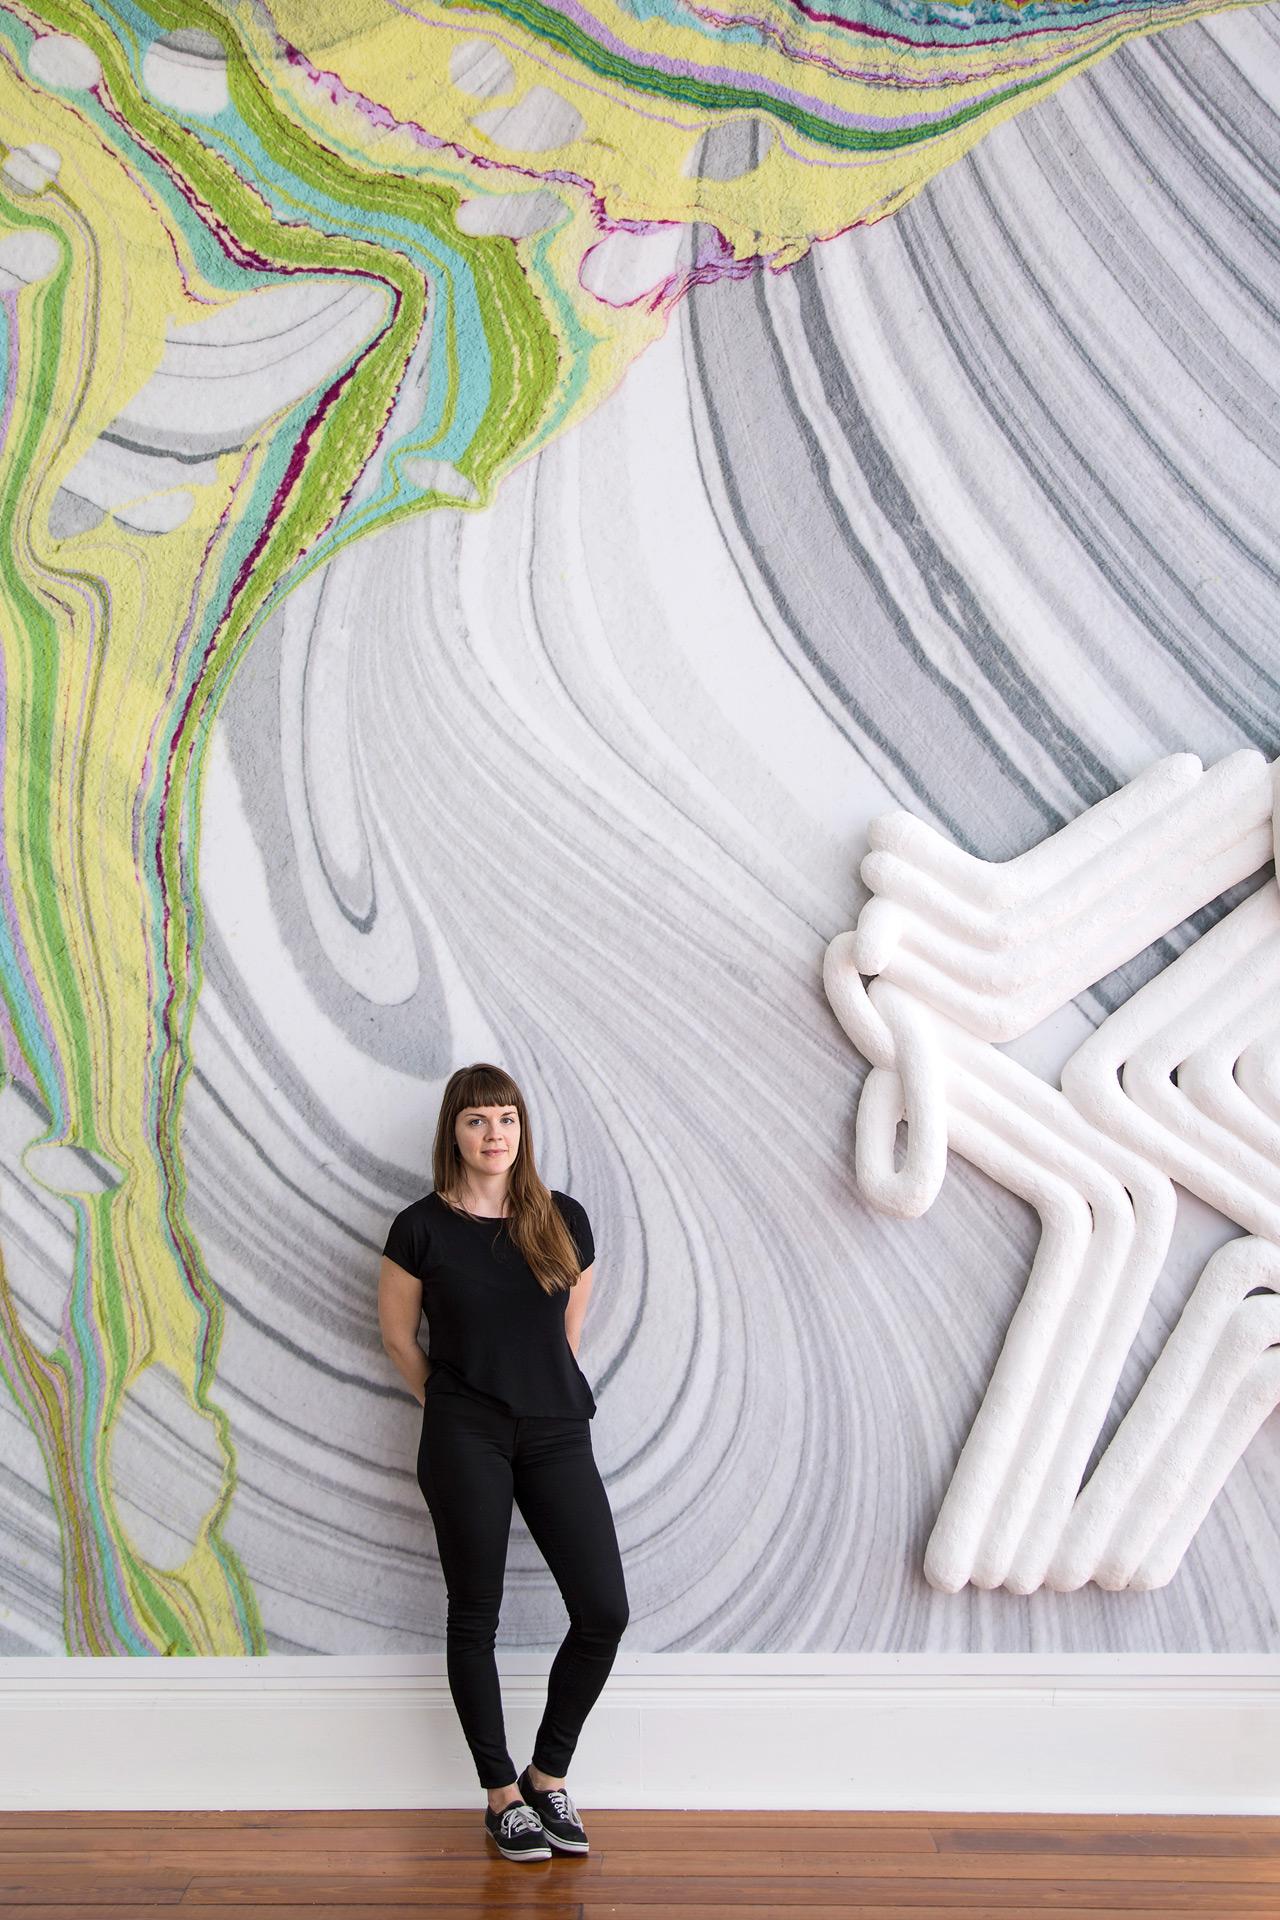 University Calendar Design : Lauren clay gallery talk 'squash and stretch scad